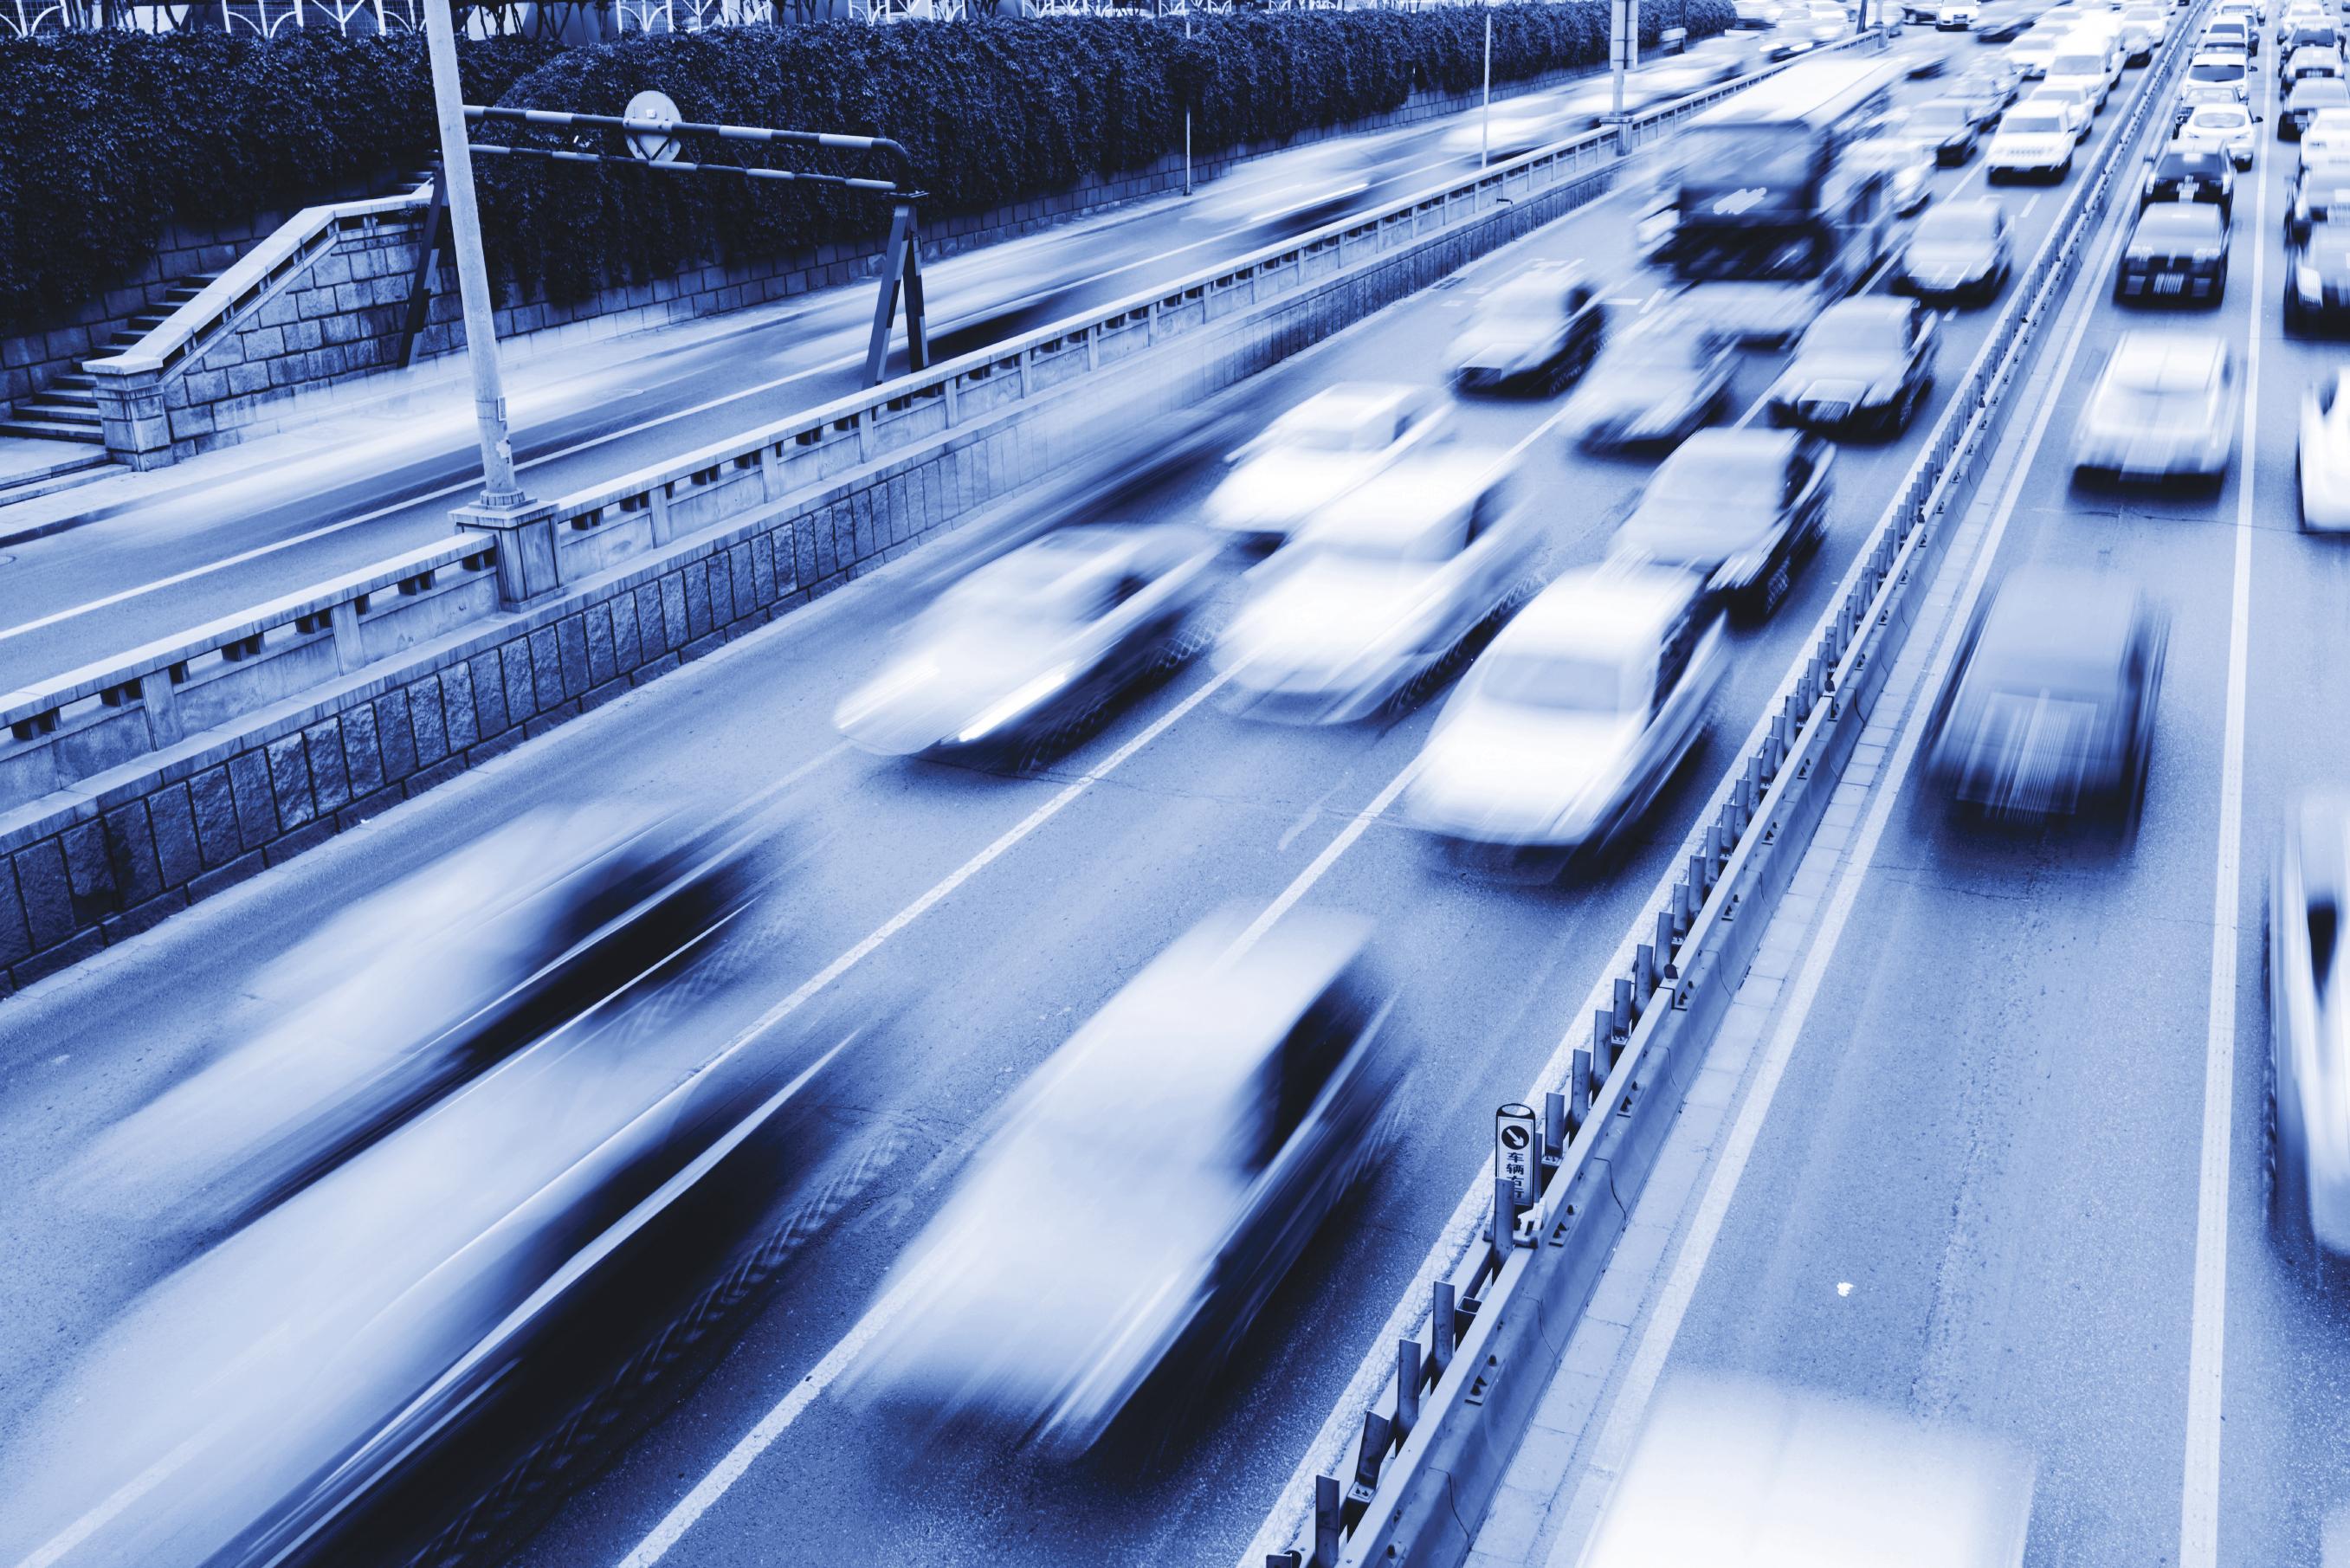 Merging Methodically Onto Highways